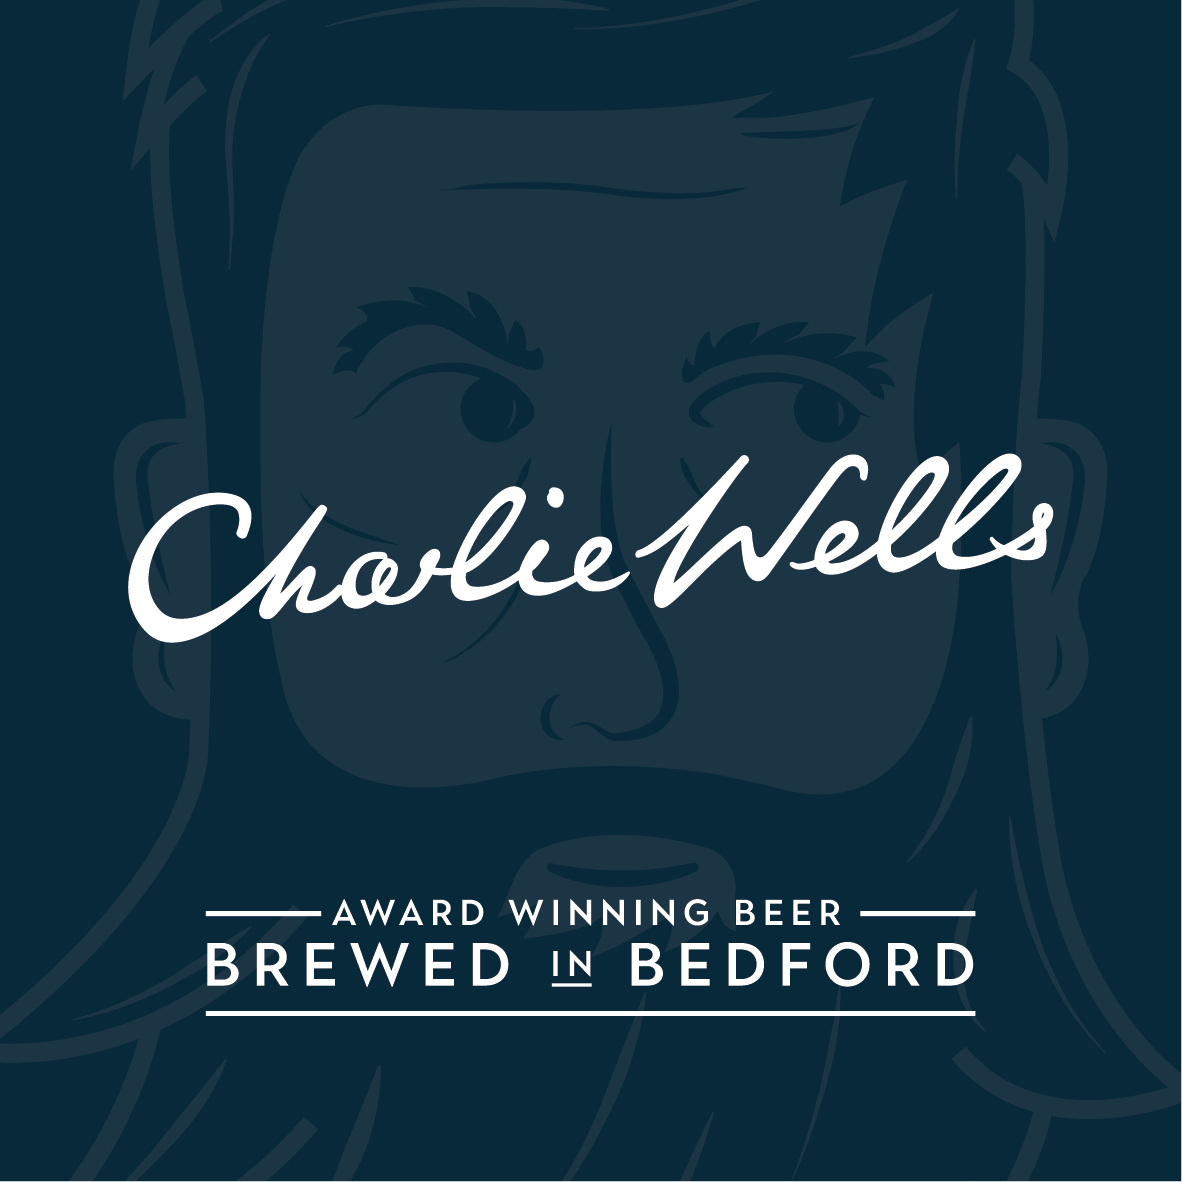 CHARLIE WELLS